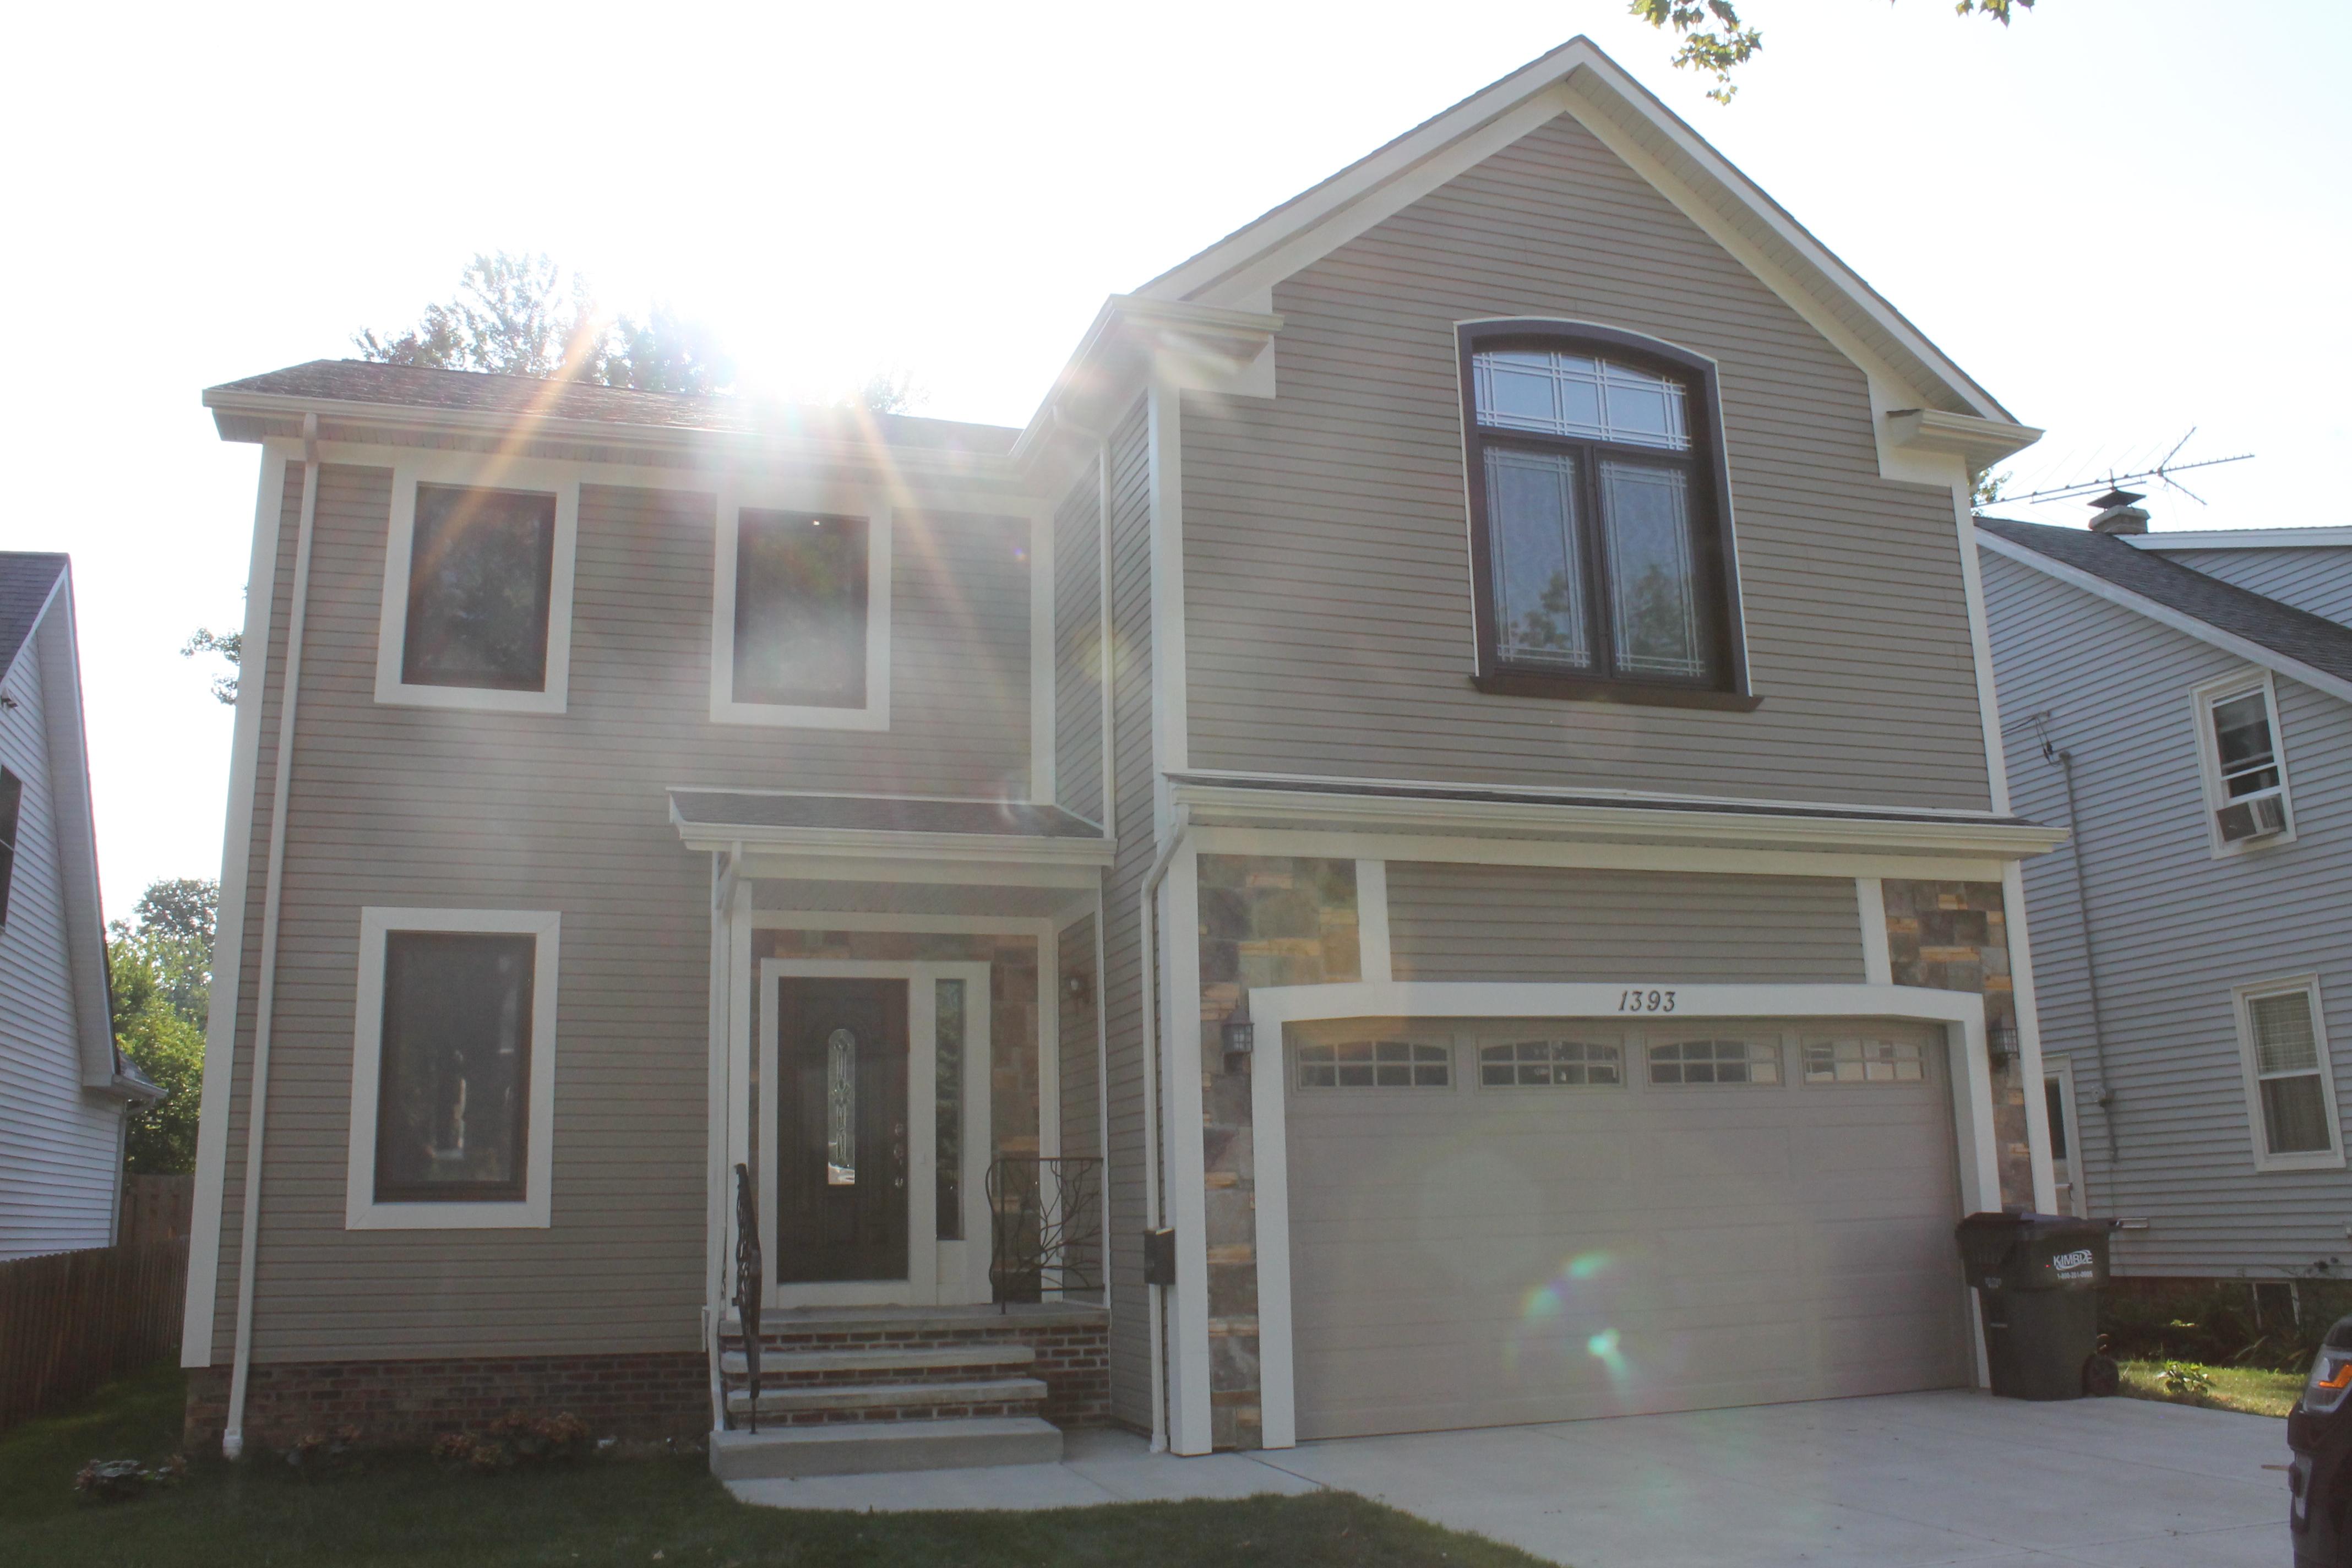 IMG 3693 - Single Family Home